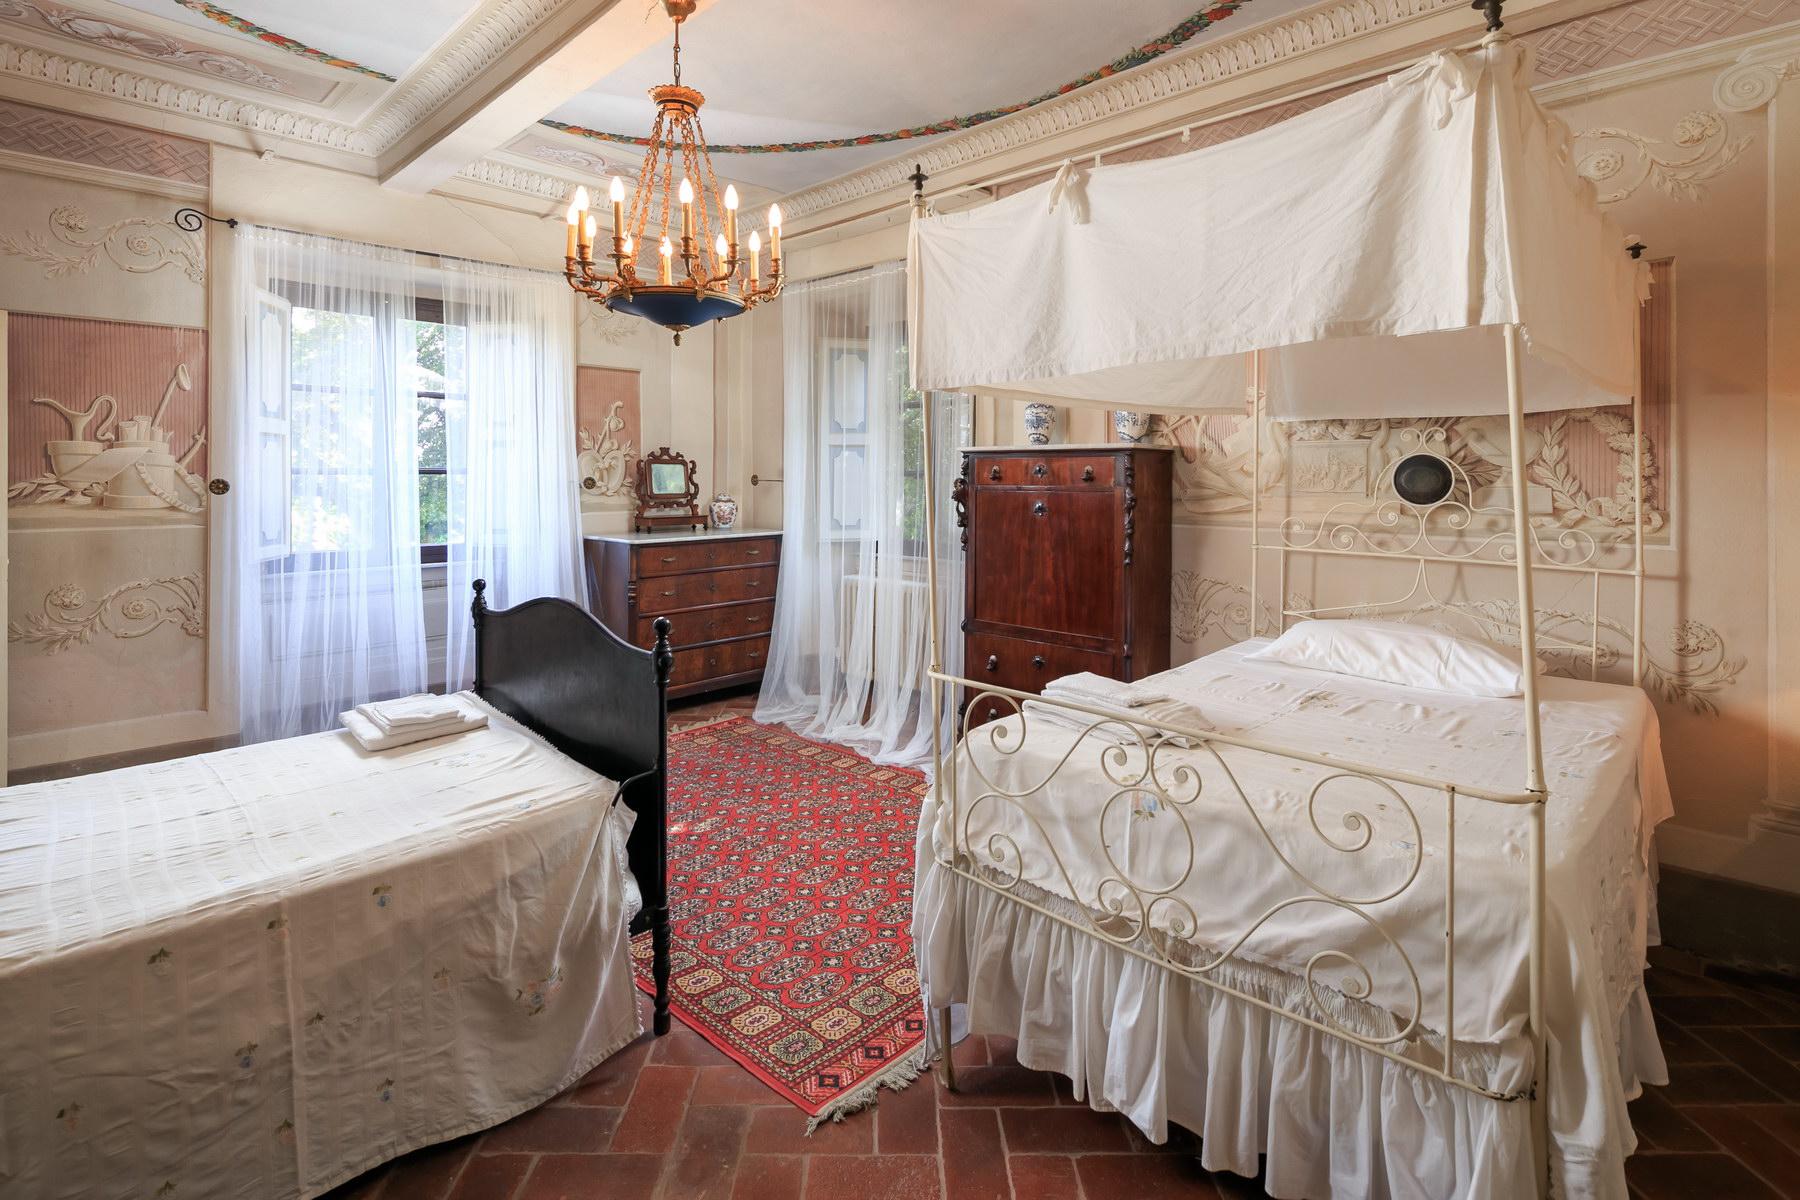 Villa in Vendita a Capannori: 5 locali, 570 mq - Foto 11